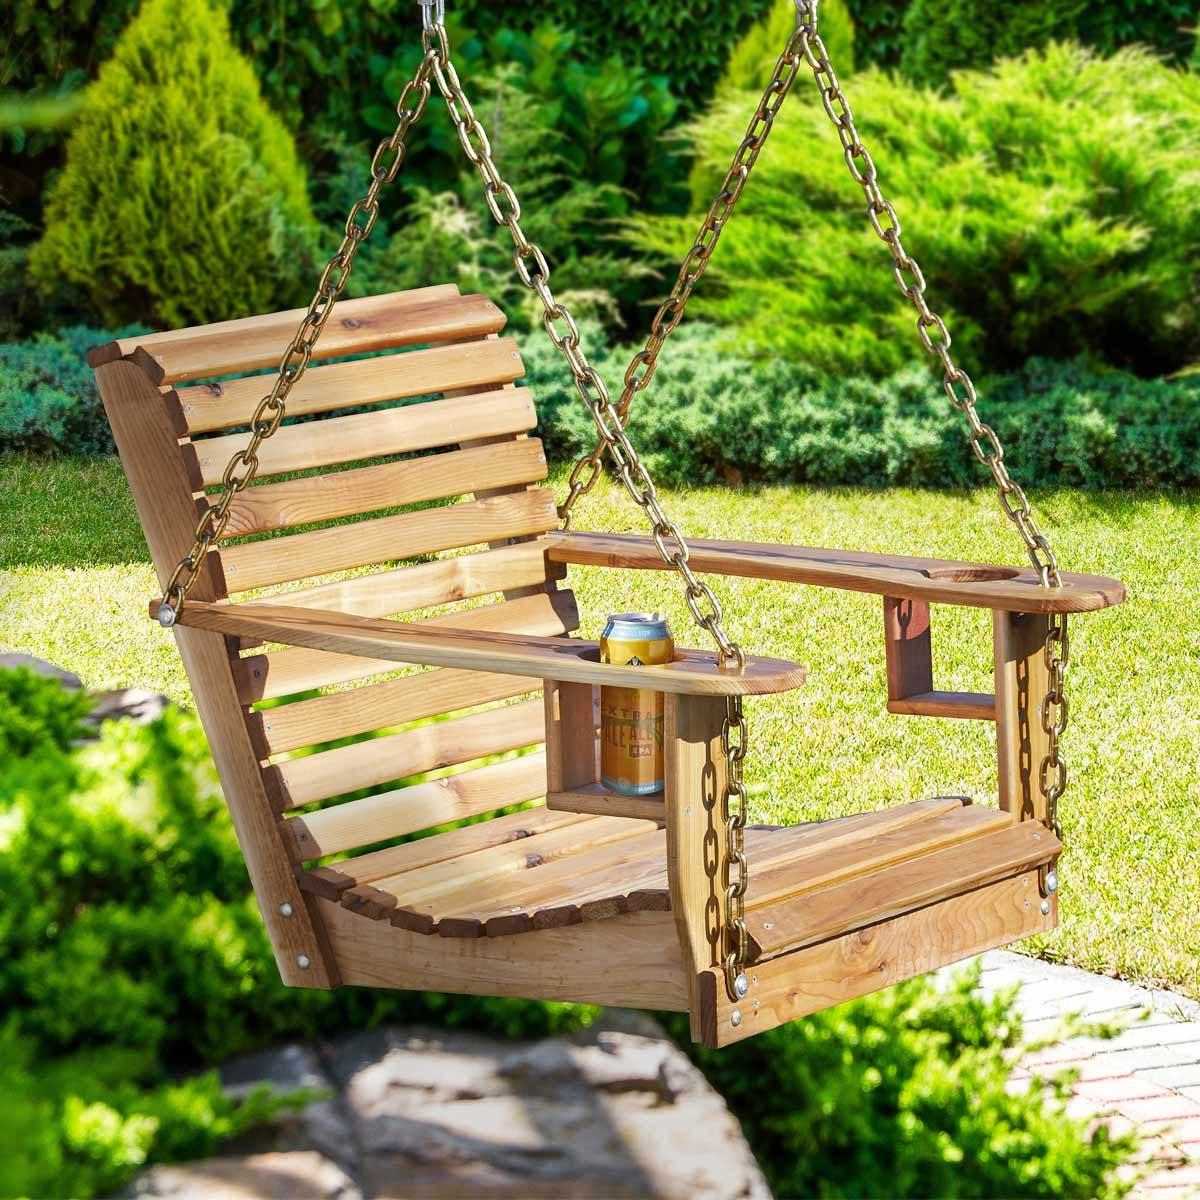 How to Build a Backyard Swing | The Family Handyman